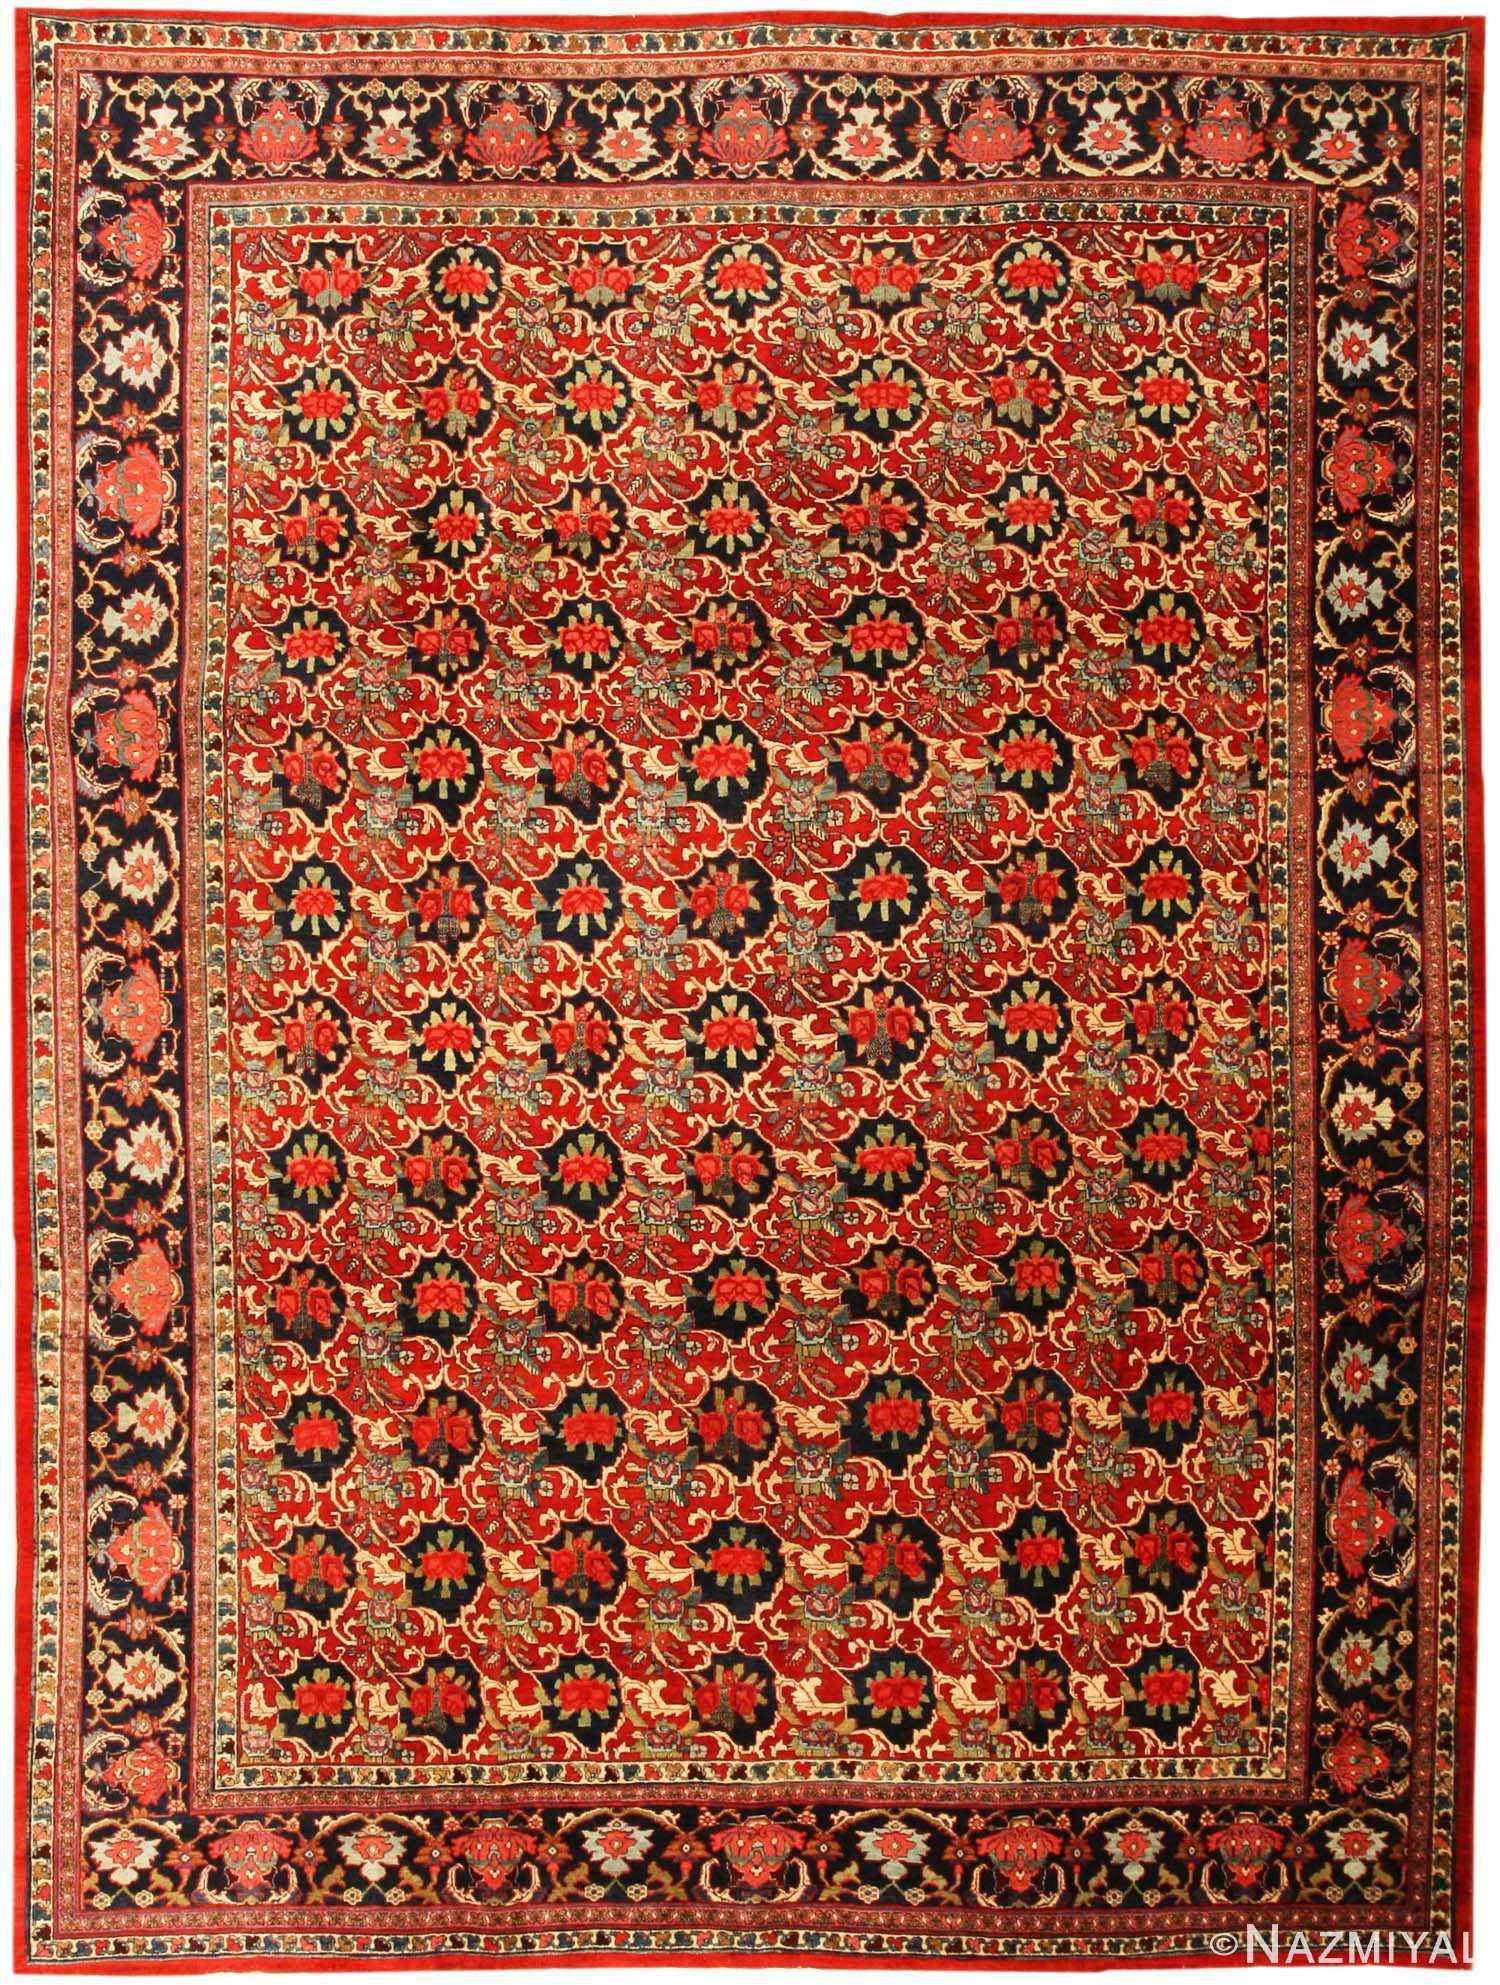 Bidjar Persian Carpet 43562 by Nazmiyal